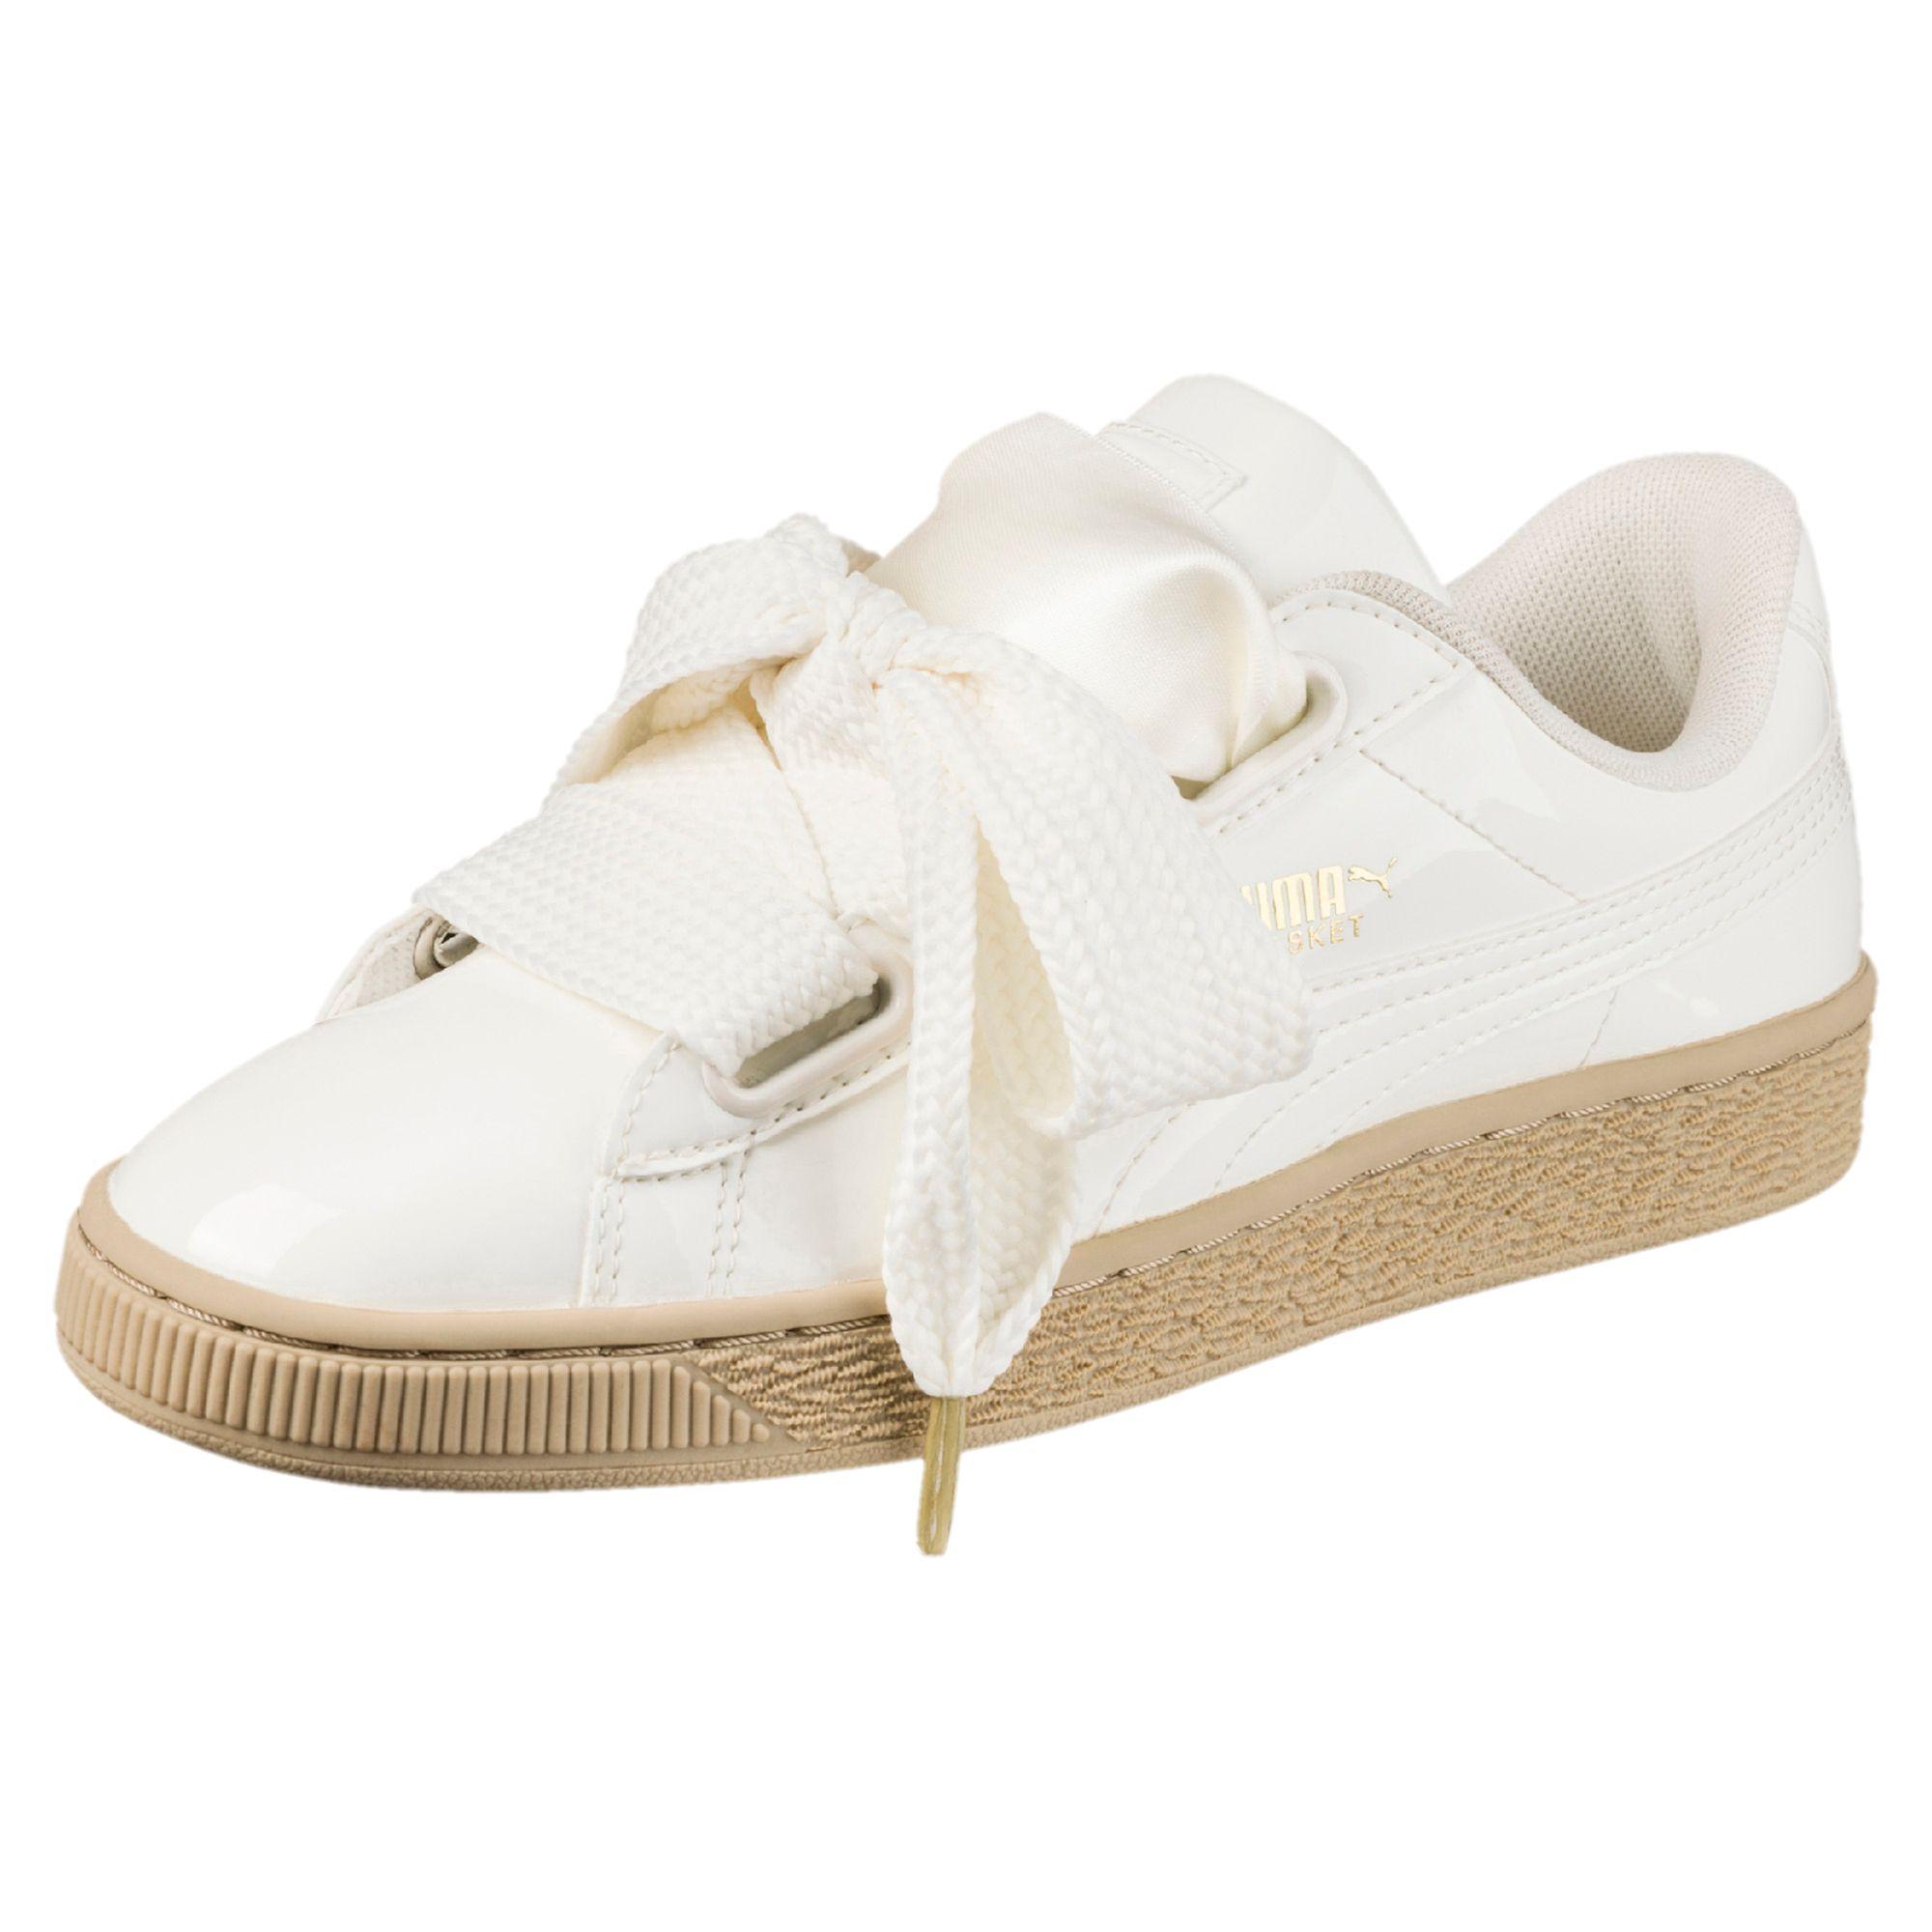 742b52c99e2 Puma - Basket Heart Patent Wn s - Marshmallow Marshmallow Blanc - Chaussures  Basket Femme GH8HUA1Z - destrainspourtous.fr